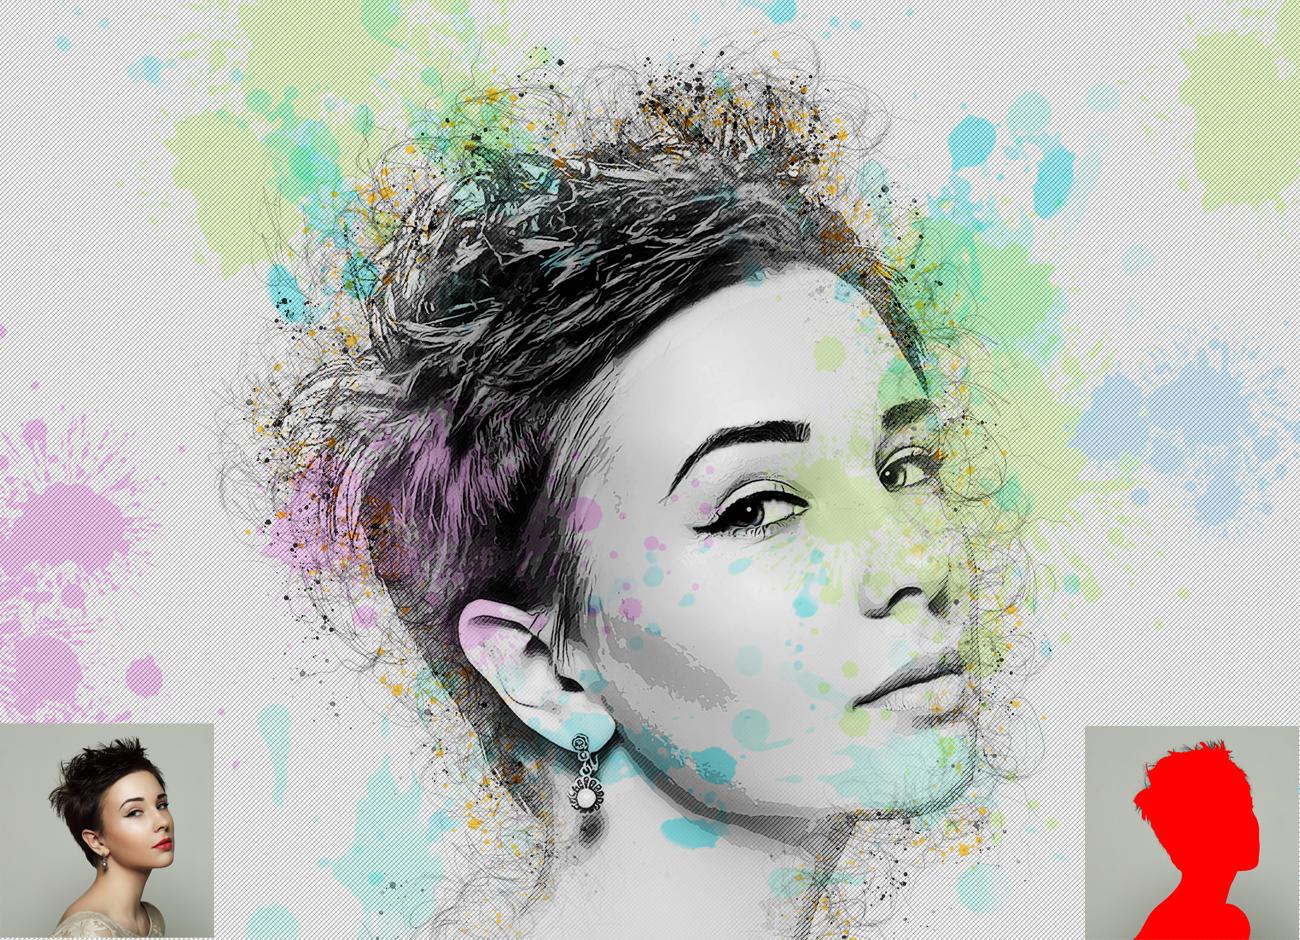 抽象铅笔素描效果照片处理特效PS动作模板 Abstract Sketch Photoshop Action插图1